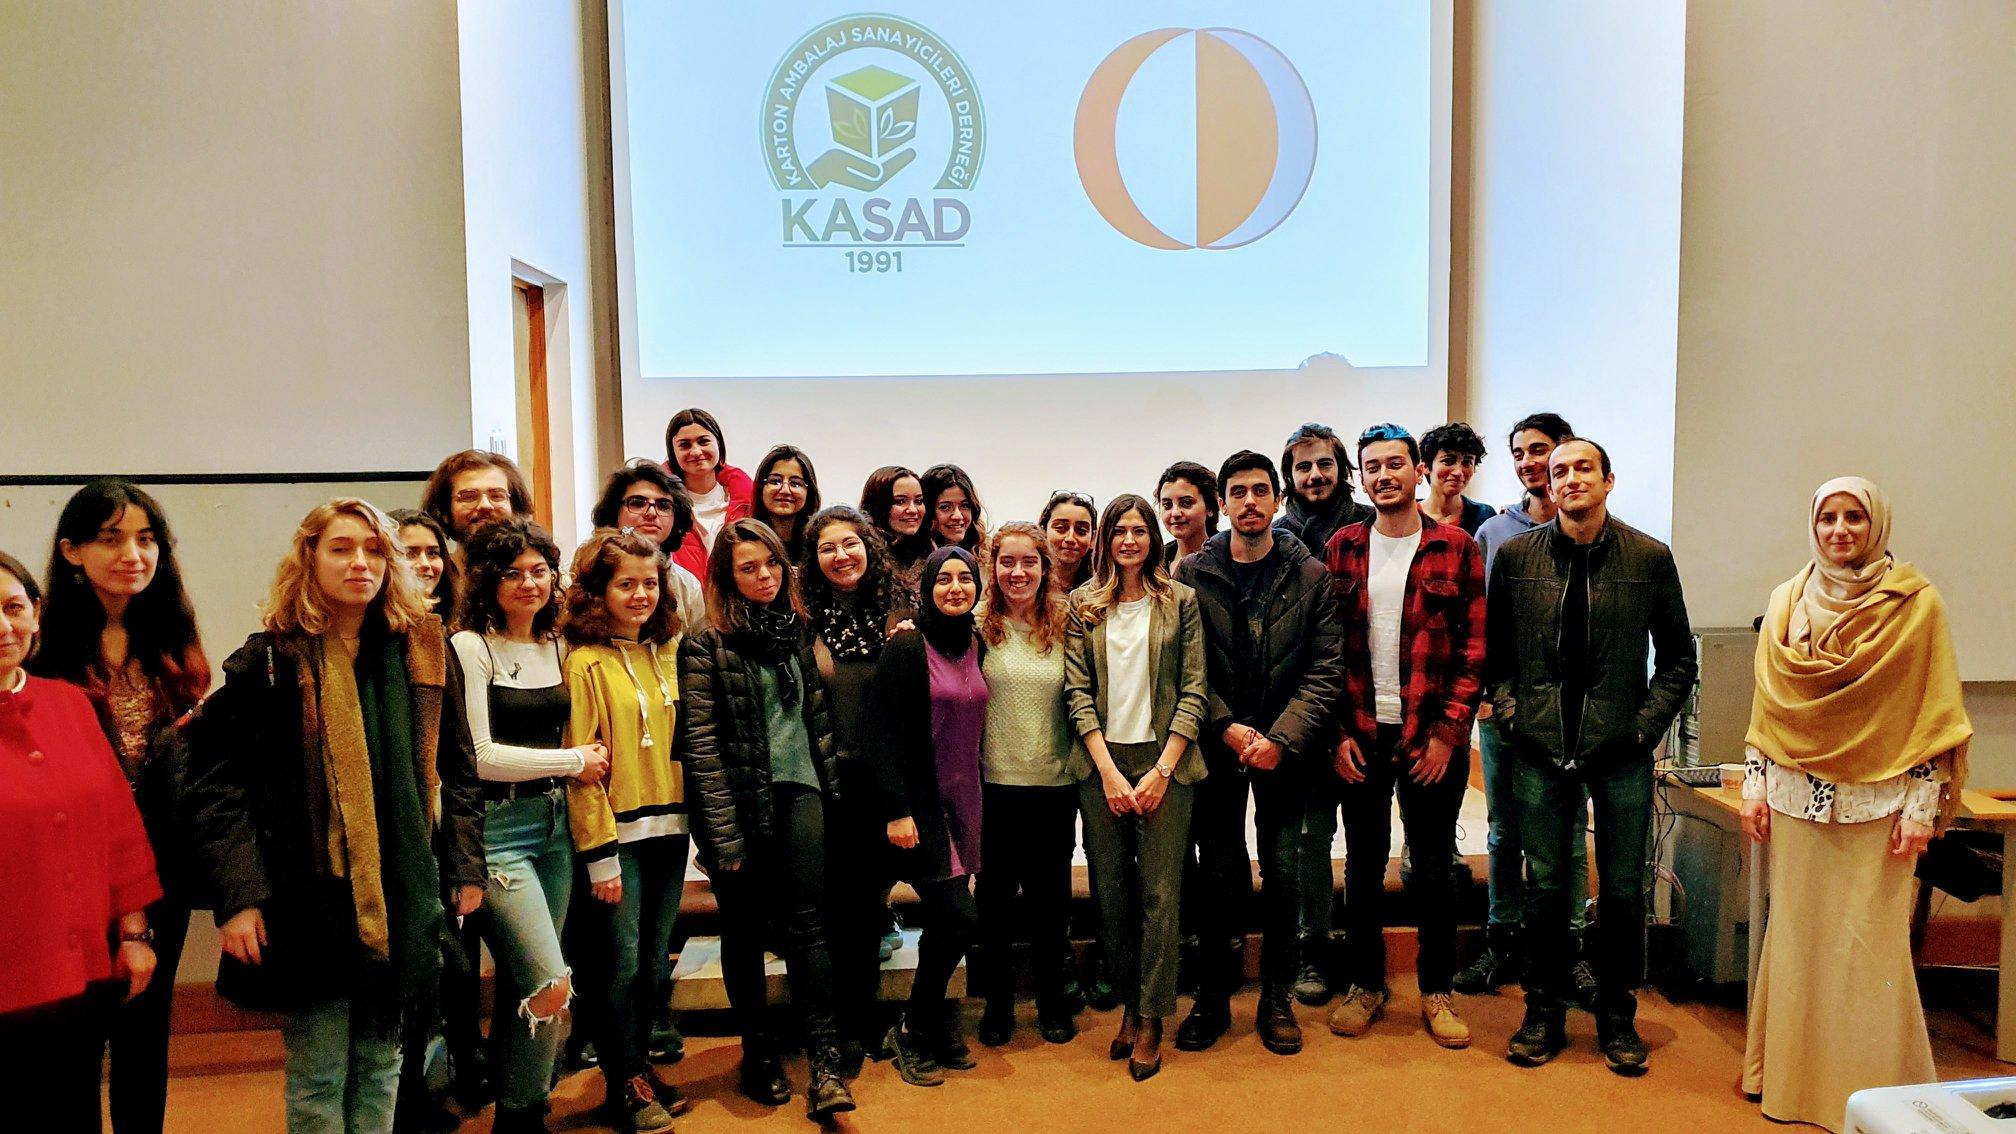 Orta Doğu Teknik Üniversitesi'nde KASAD Semineri I 21/02/2020